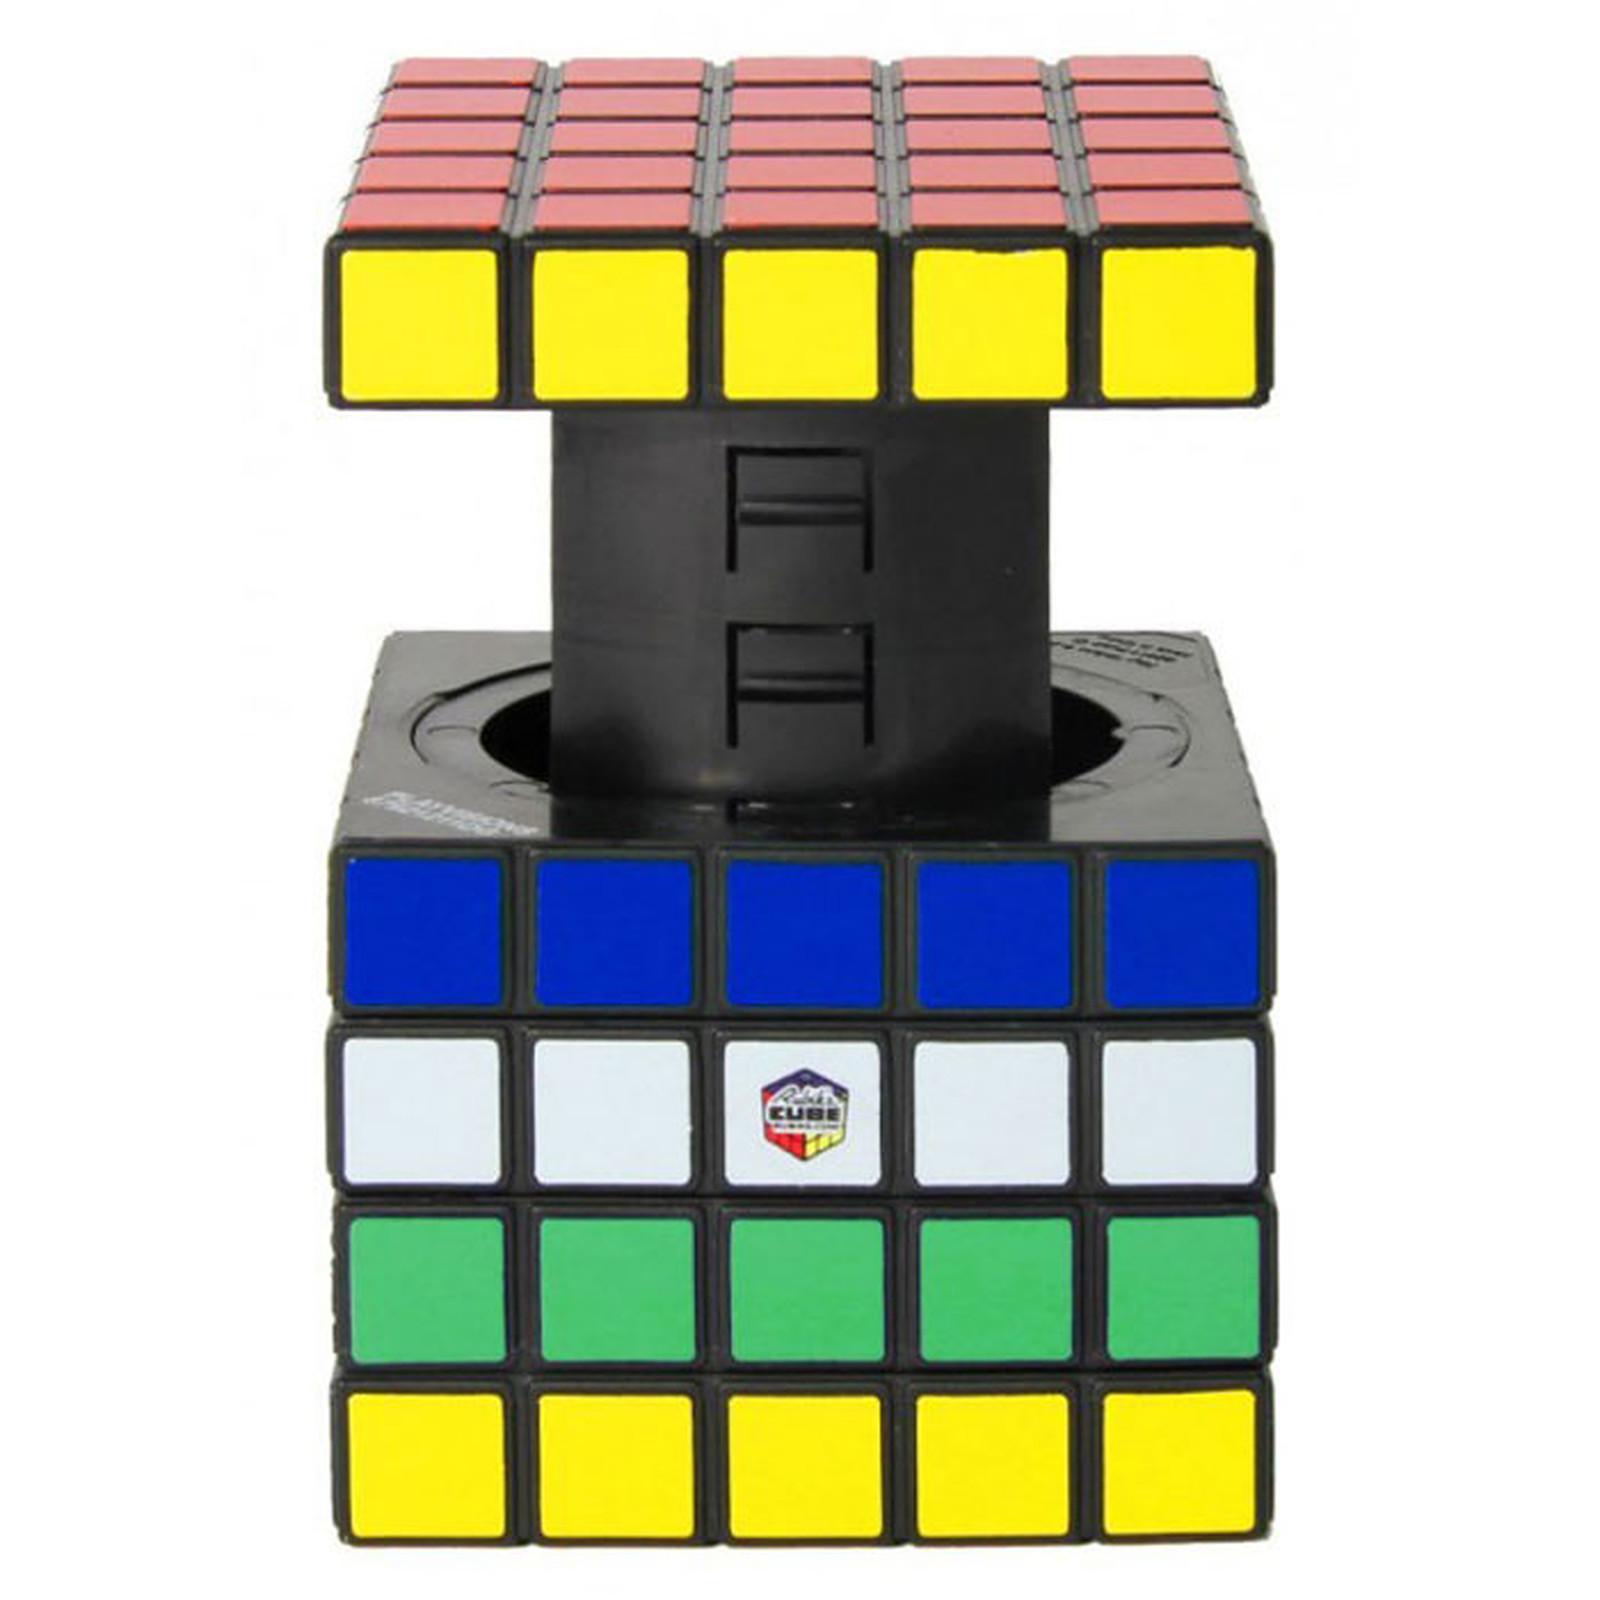 Coffre Fort Rubiks Cube